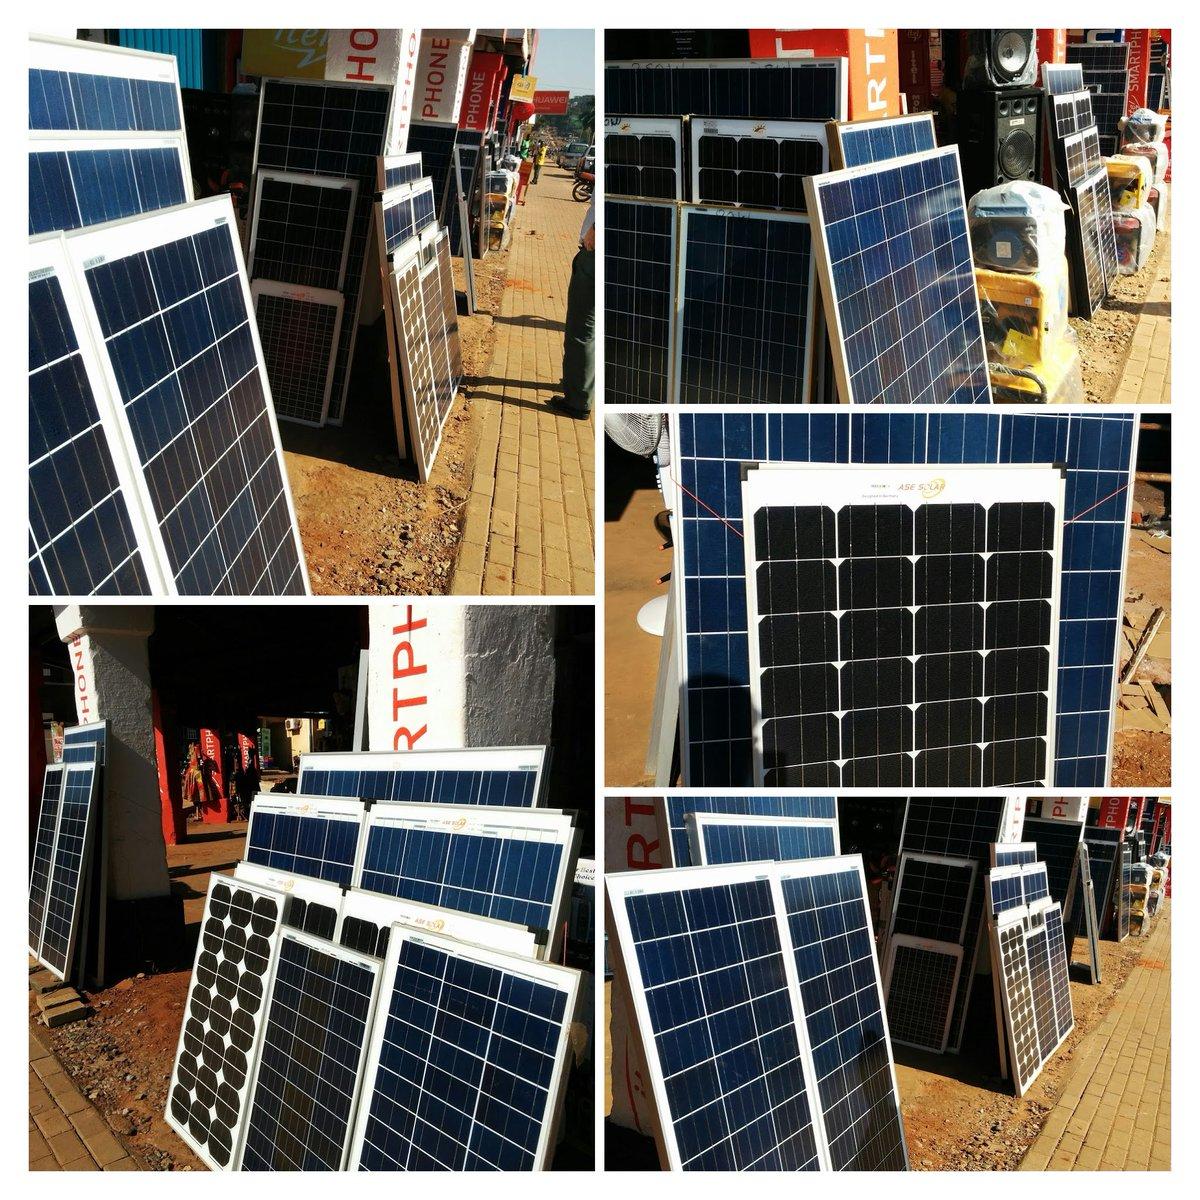 Gulu is awash in solar panels.  Yours for $1 - $1.5 per Watt depending on quality. Pretty cool.  #Uganda https://t.co/0dGXJaNvXw